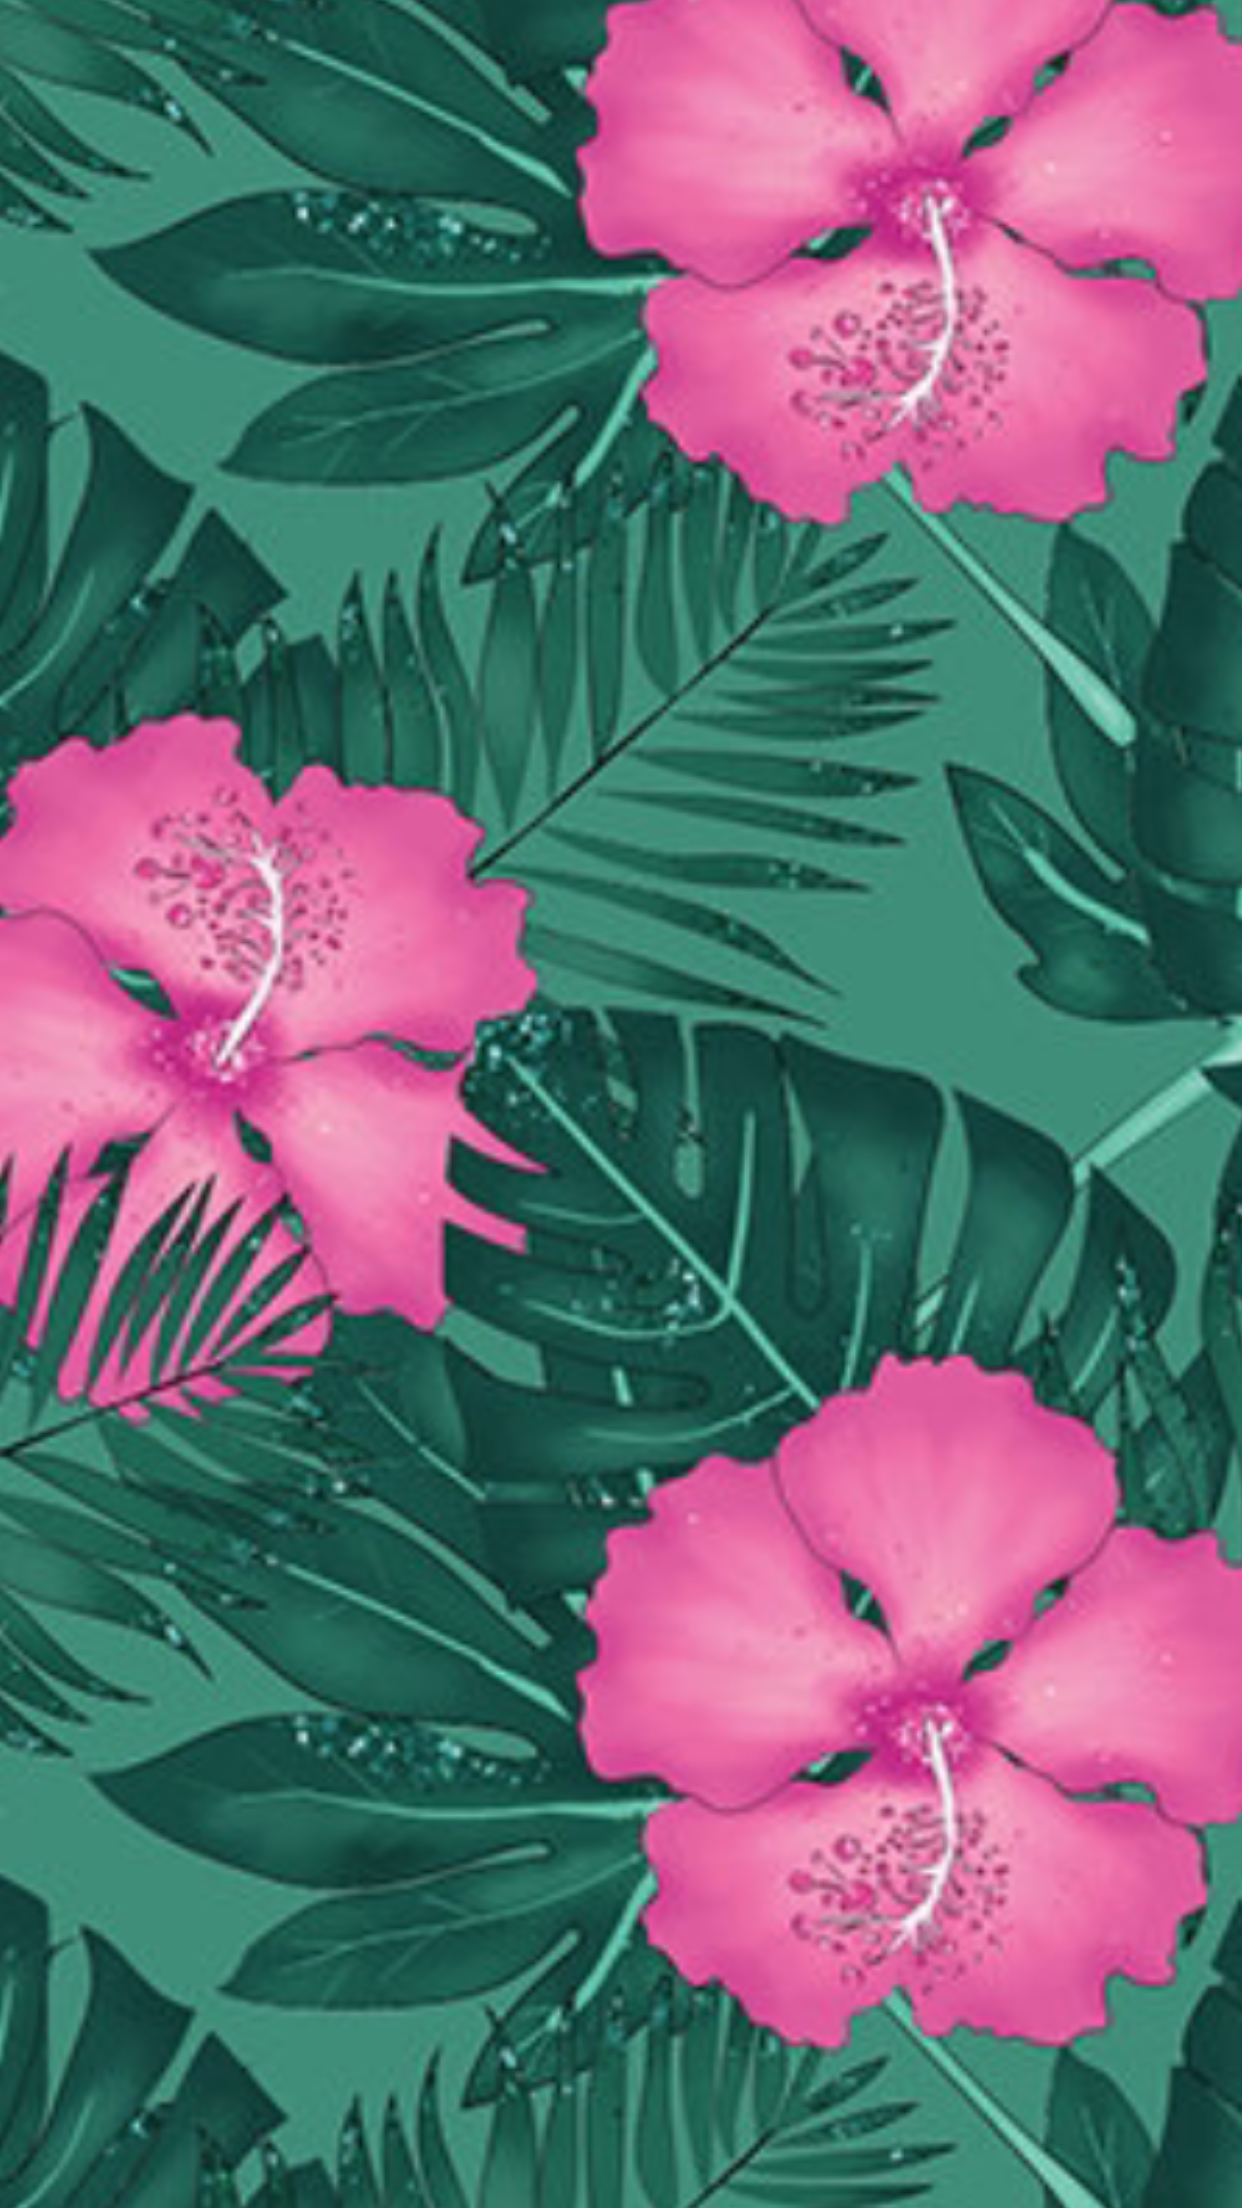 Pink Hibiscus Iphone Wallpaper Flower Iphone Wallpaper Flower Wallpaper Lotus Flower Wallpaper